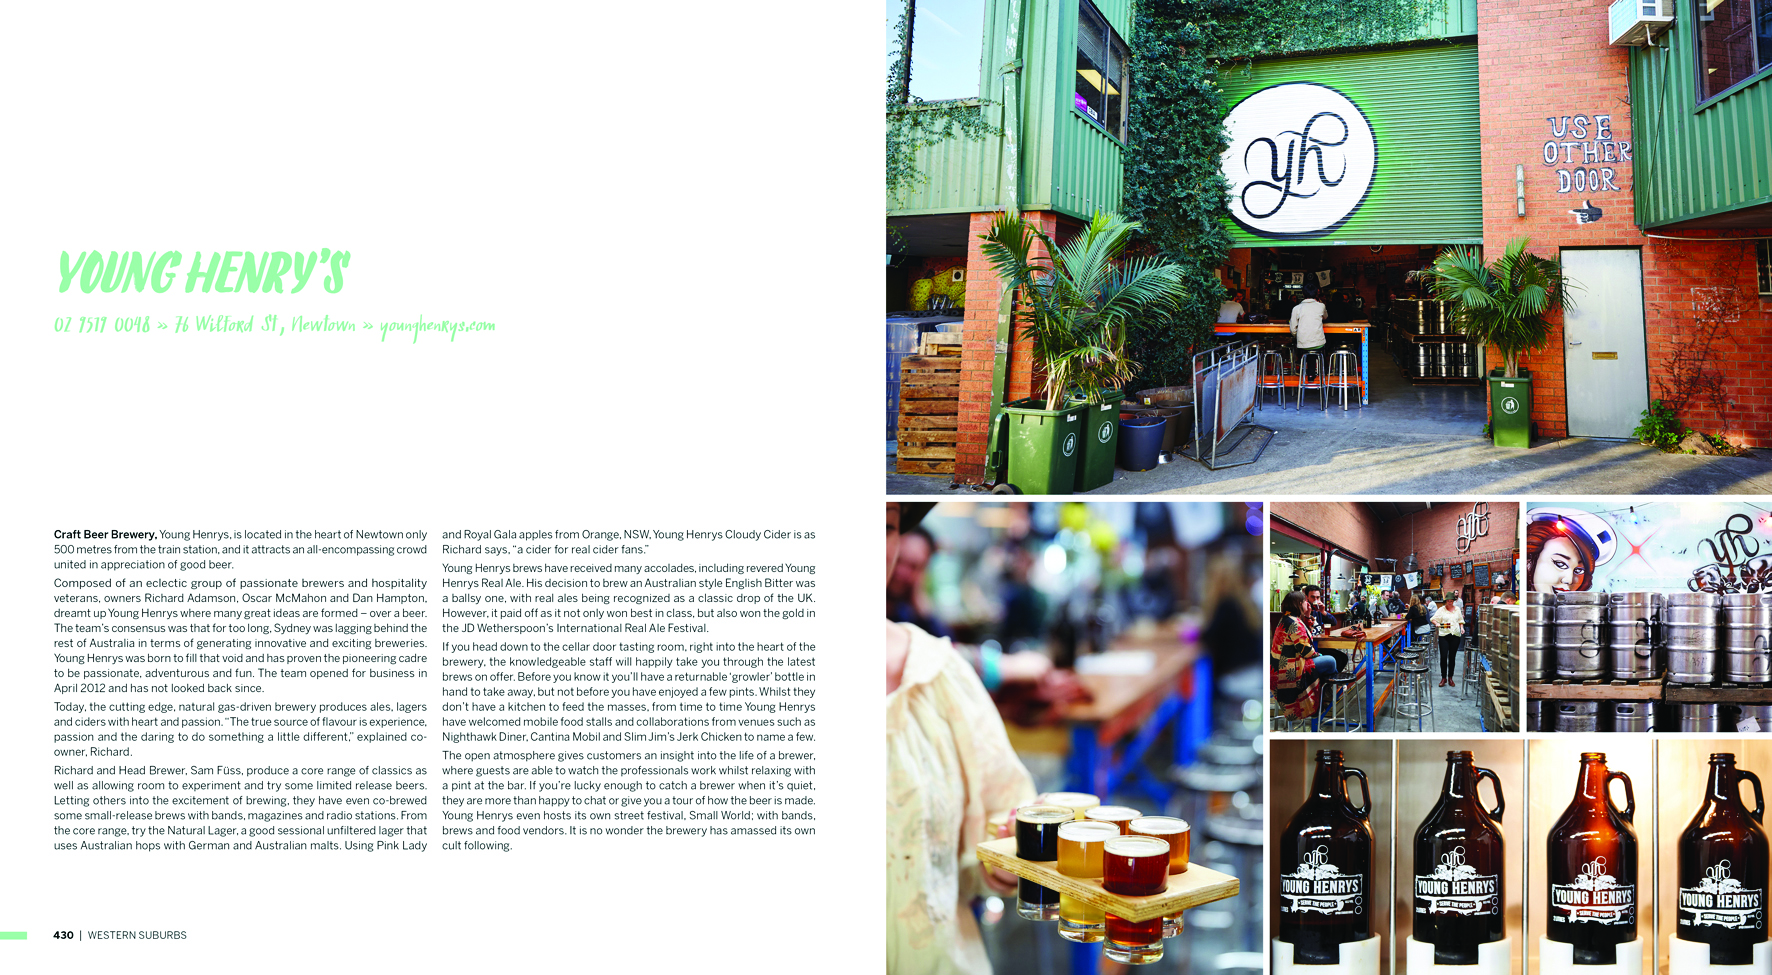 Flavours-of-Urban-Sydney-pg430.jpg